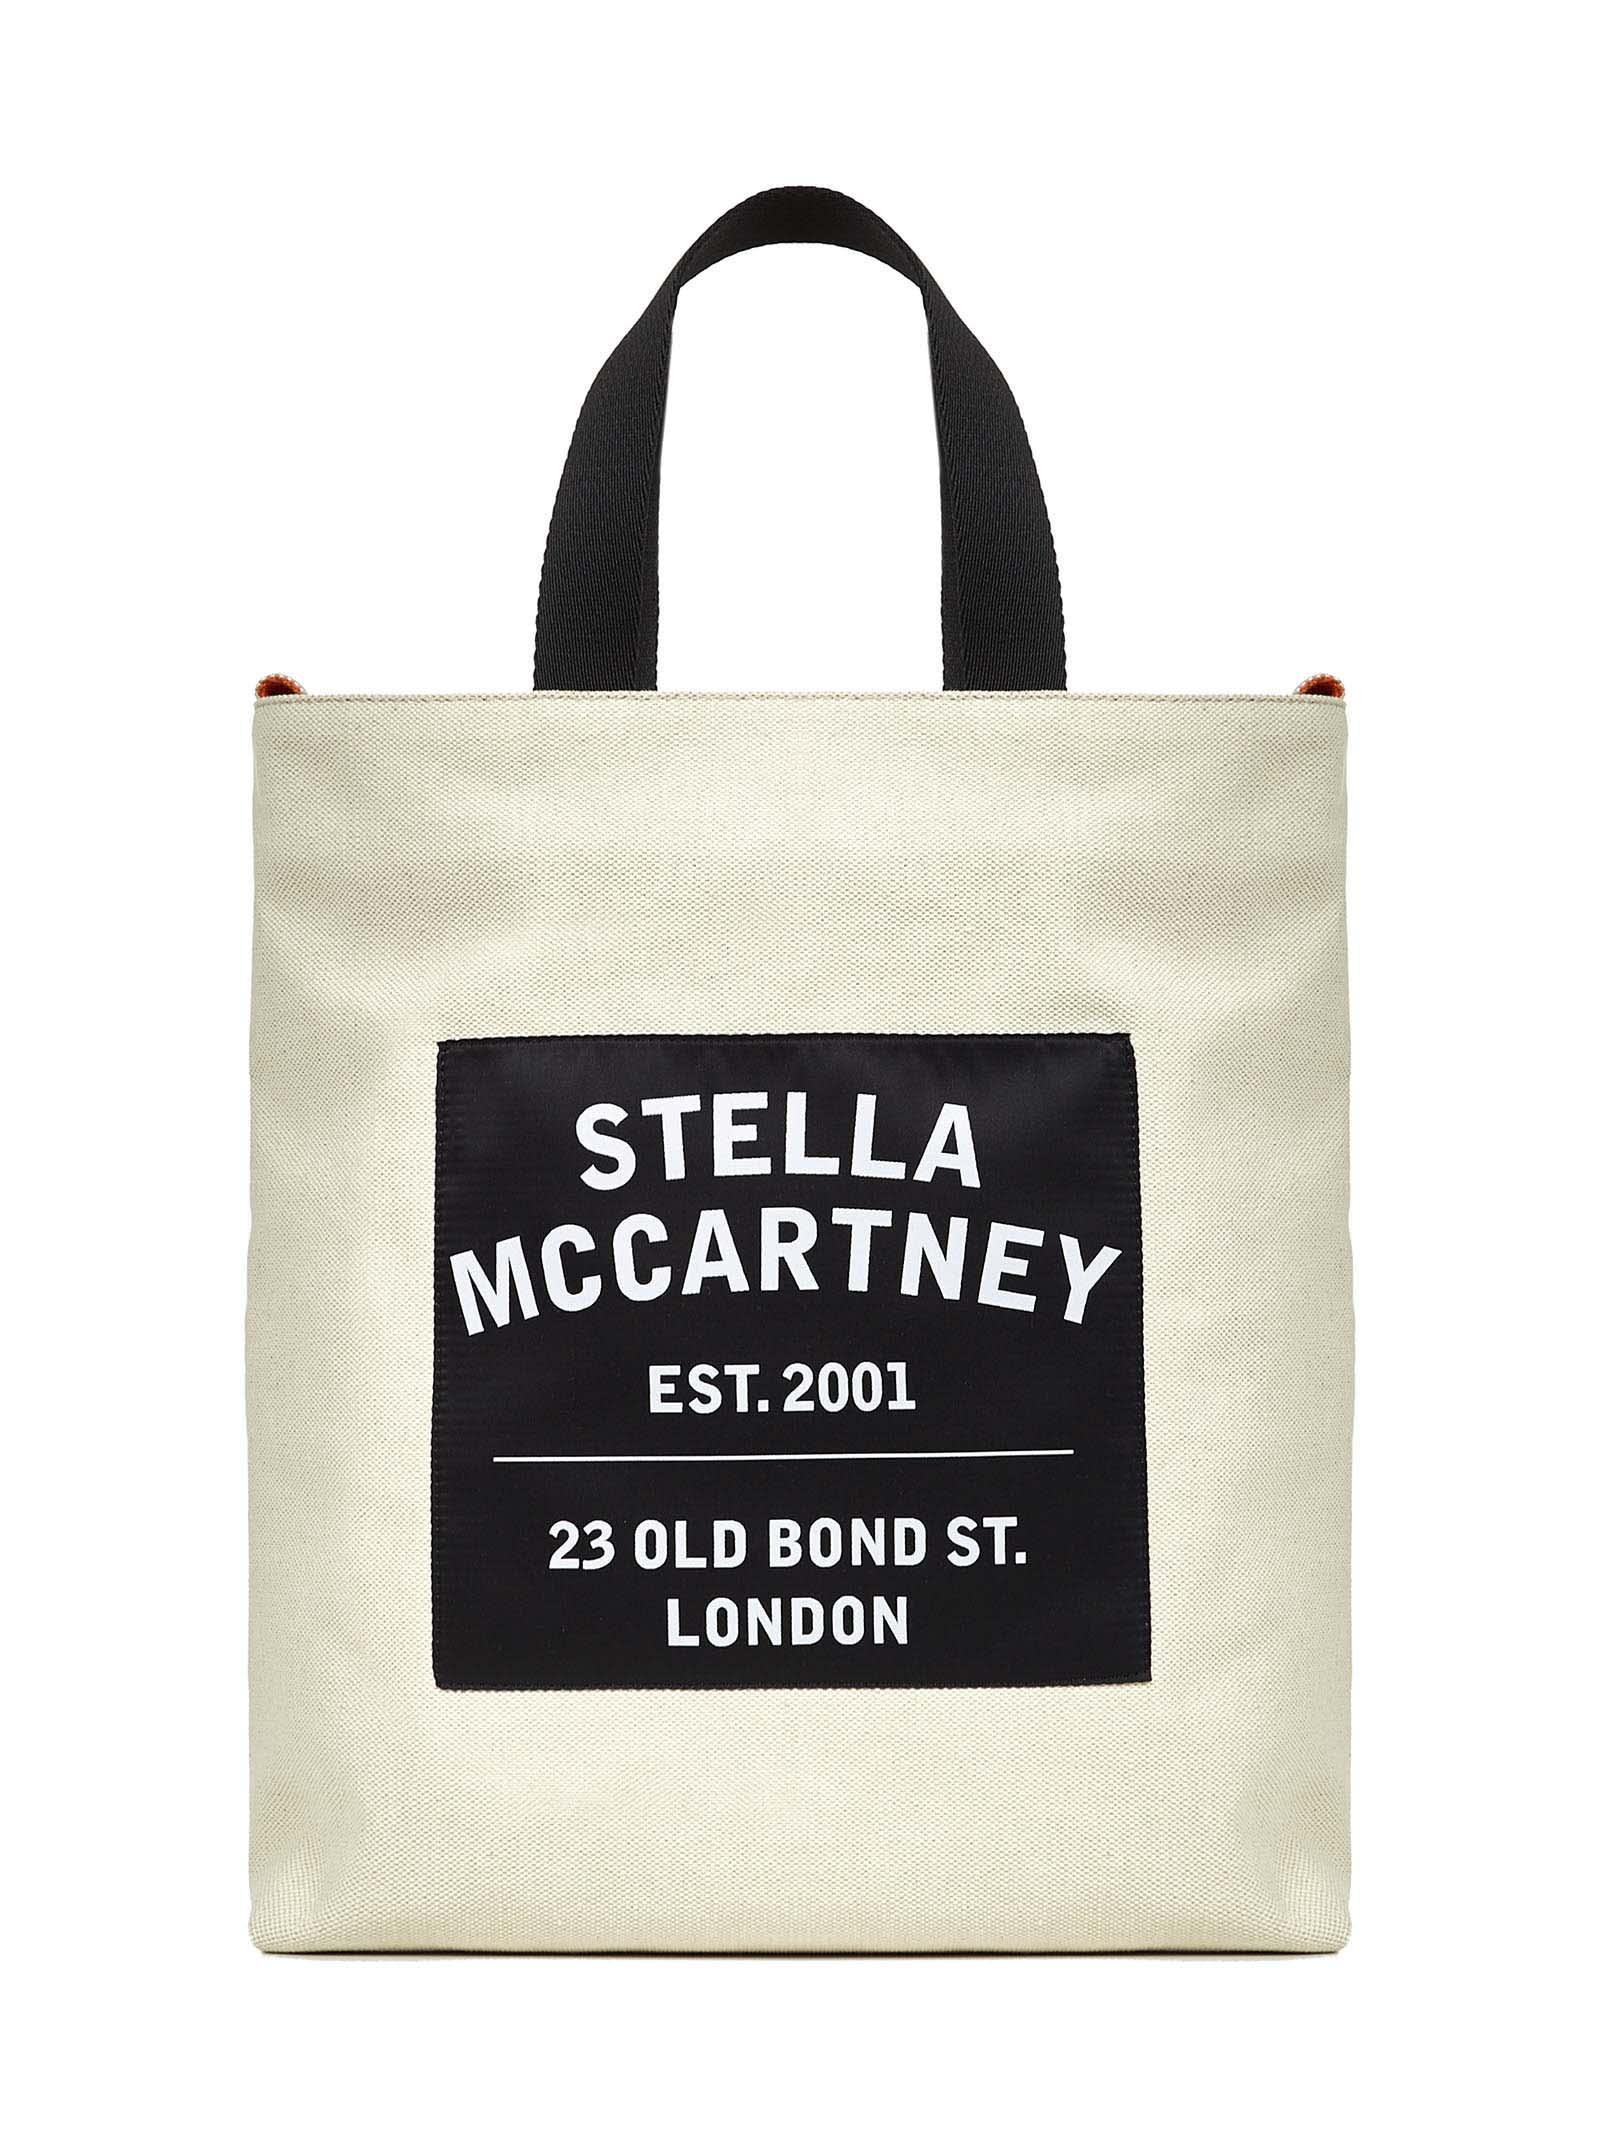 STELLA MCCARTNEY STELLA MCCARTNEY TOTE BAG